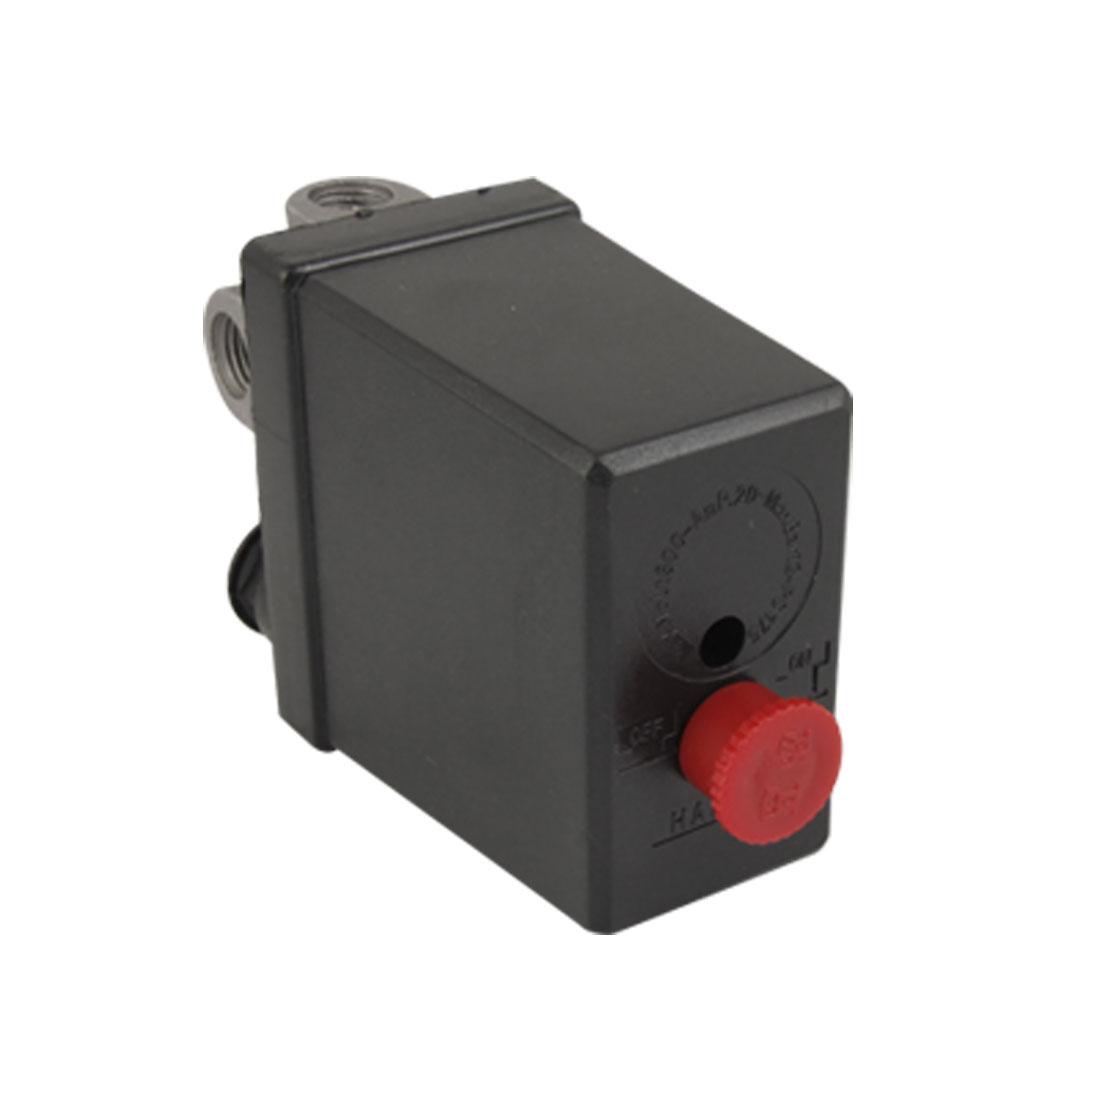 NC 4 Ports Air Compressor Pressure Switch Control Valve 175 PSI AC 240V 20A